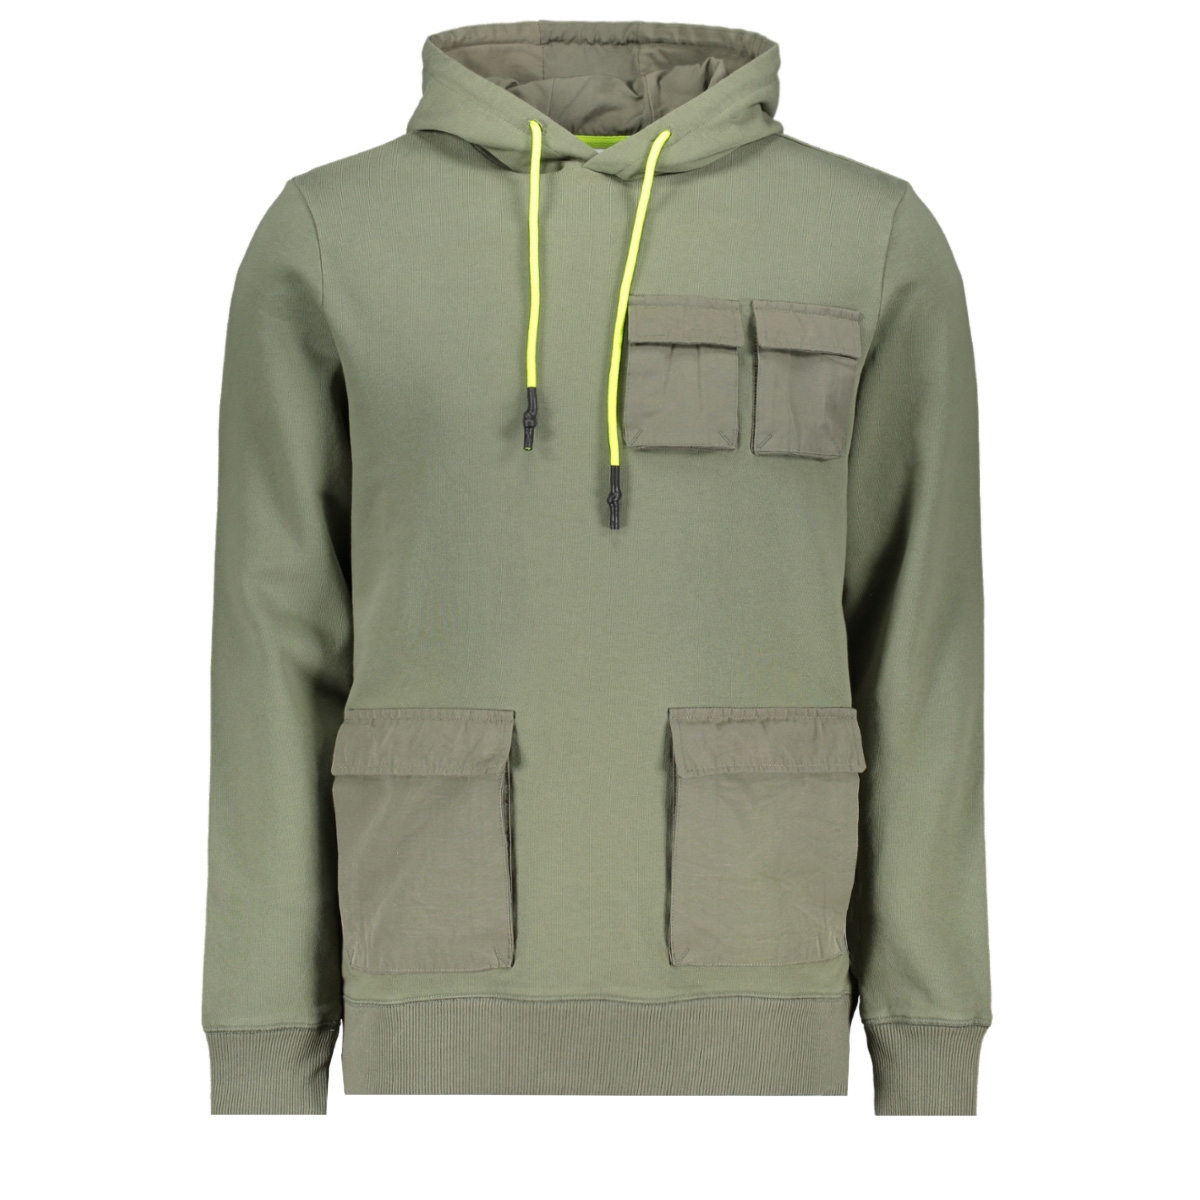 utility hoodie 20010303 purewhite sweater 10 army green